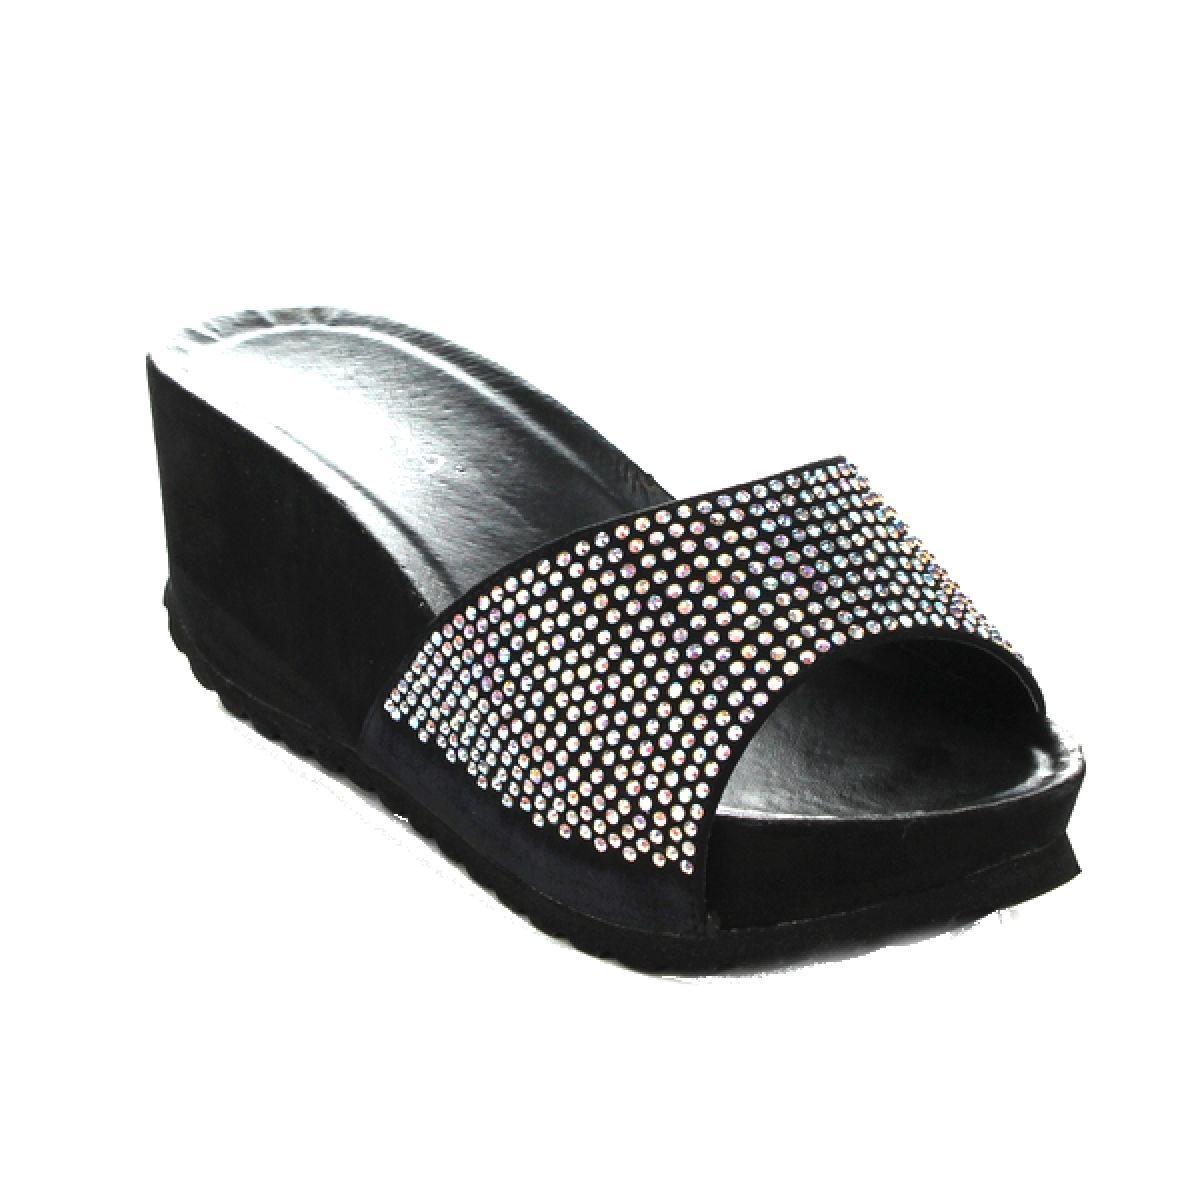 5683d743bde Liliana GENESA-1 Women s Slip-on Comfy Lug and 50 similar items. 57